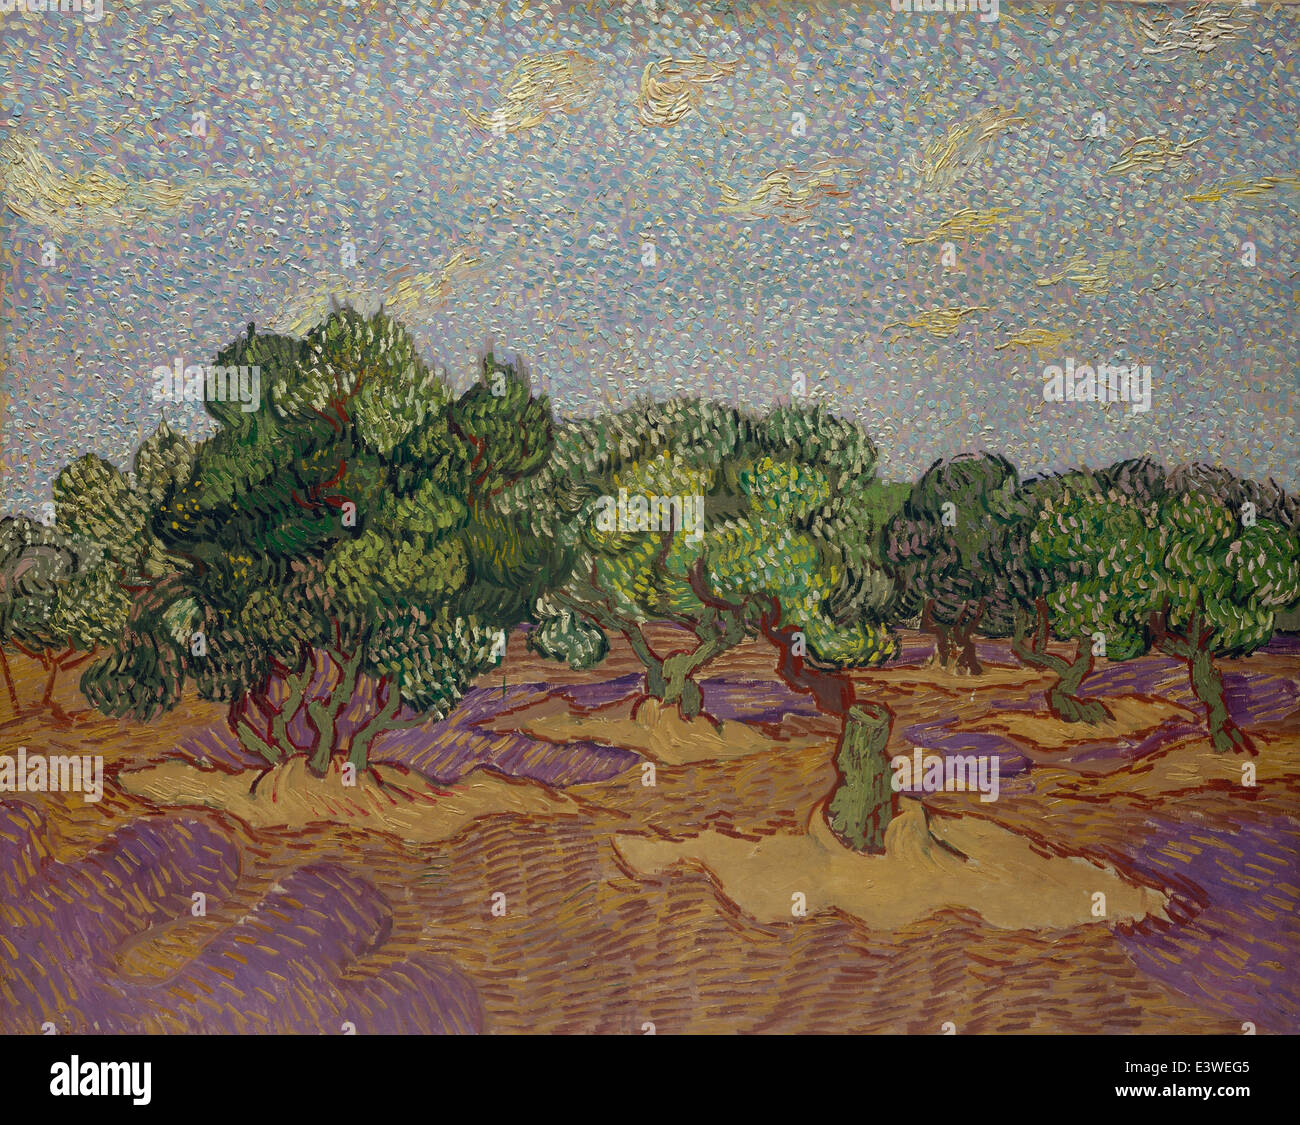 Vincent van Gogh - Olive Trees - 1889 - MET Museum - New-York - Stock Image